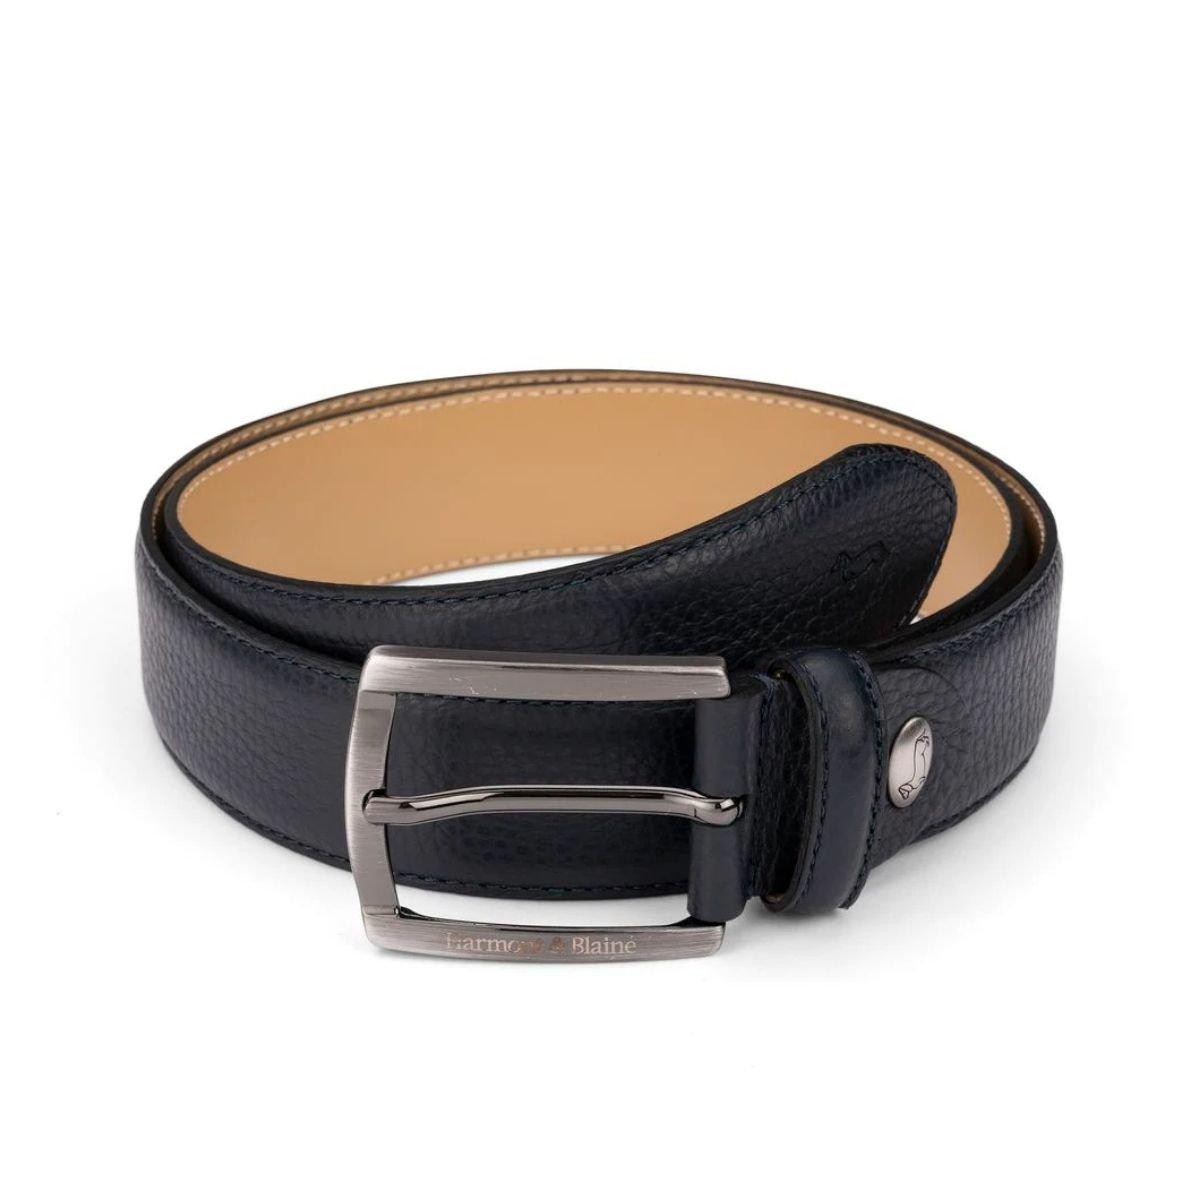 Cintura Harmont & Blaine...